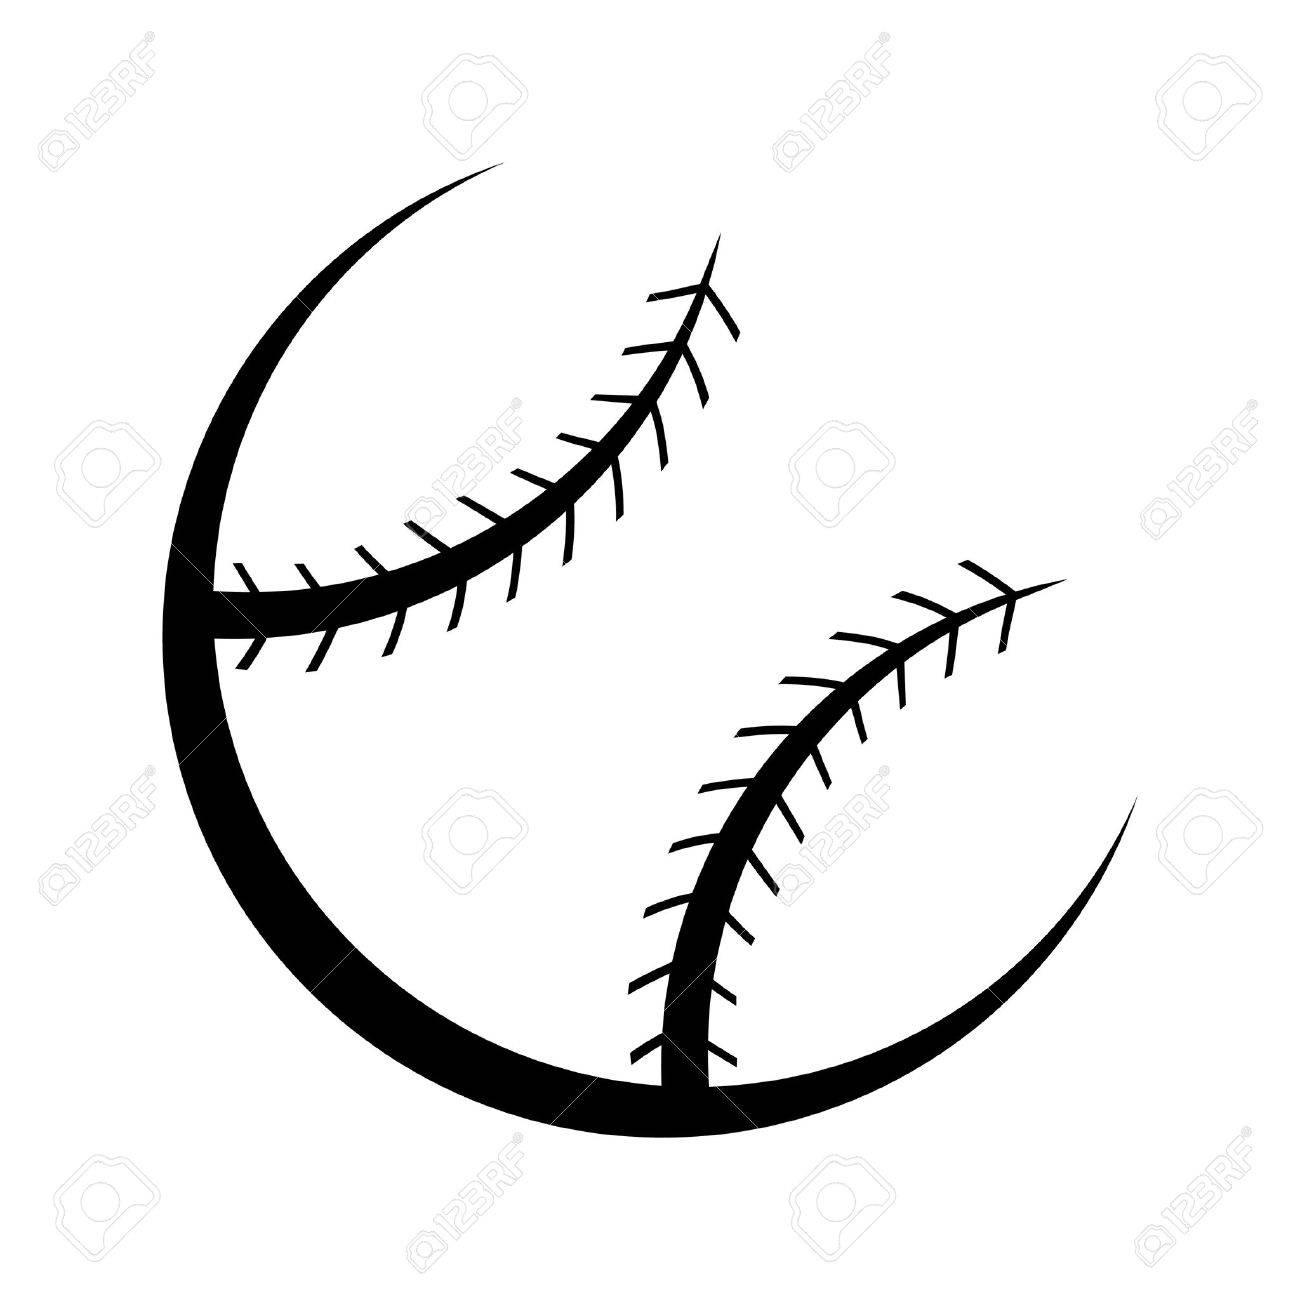 Baseball Vector Icon Royalty Free Cliparts, Vectors, And Stock ...